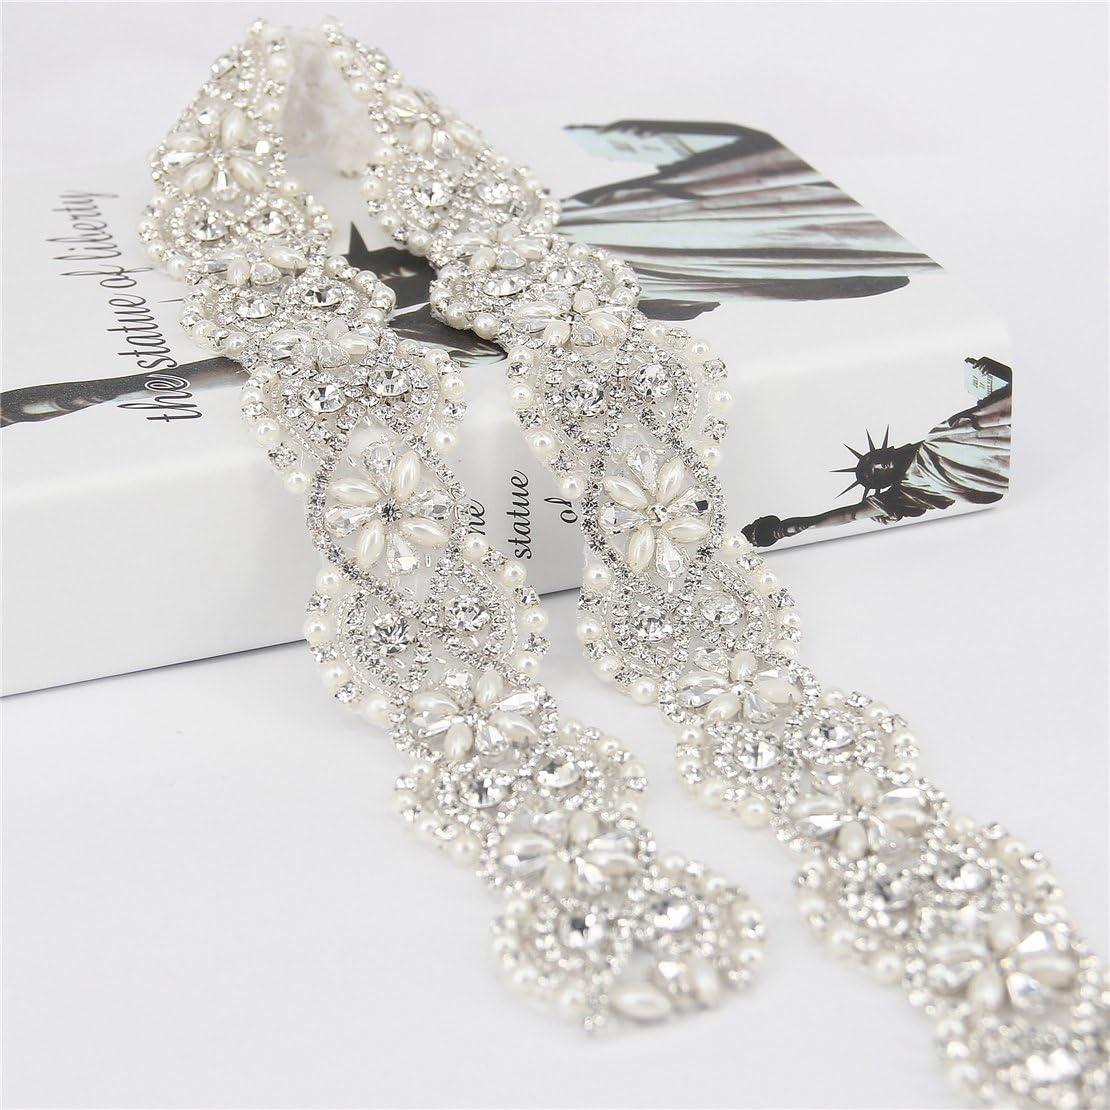 Trlyc 2015 New Vintage Crystal Wedding Belt Dress Belt Crystal Rhinestone Pearl Bridal Sash